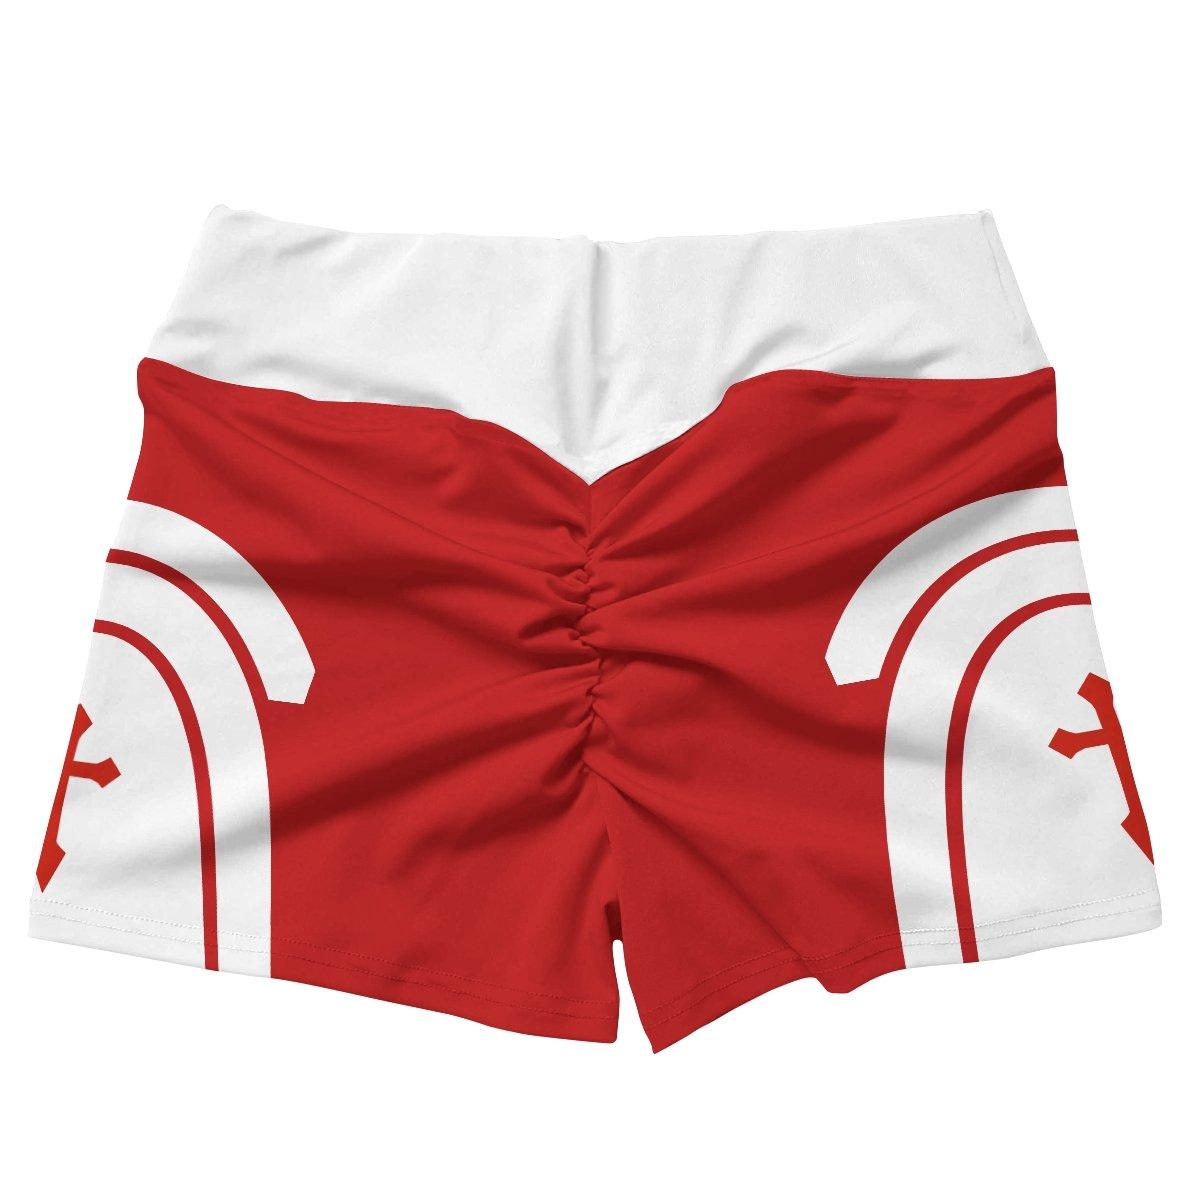 asuna summer active wear set 363991 - Anime Swimsuits